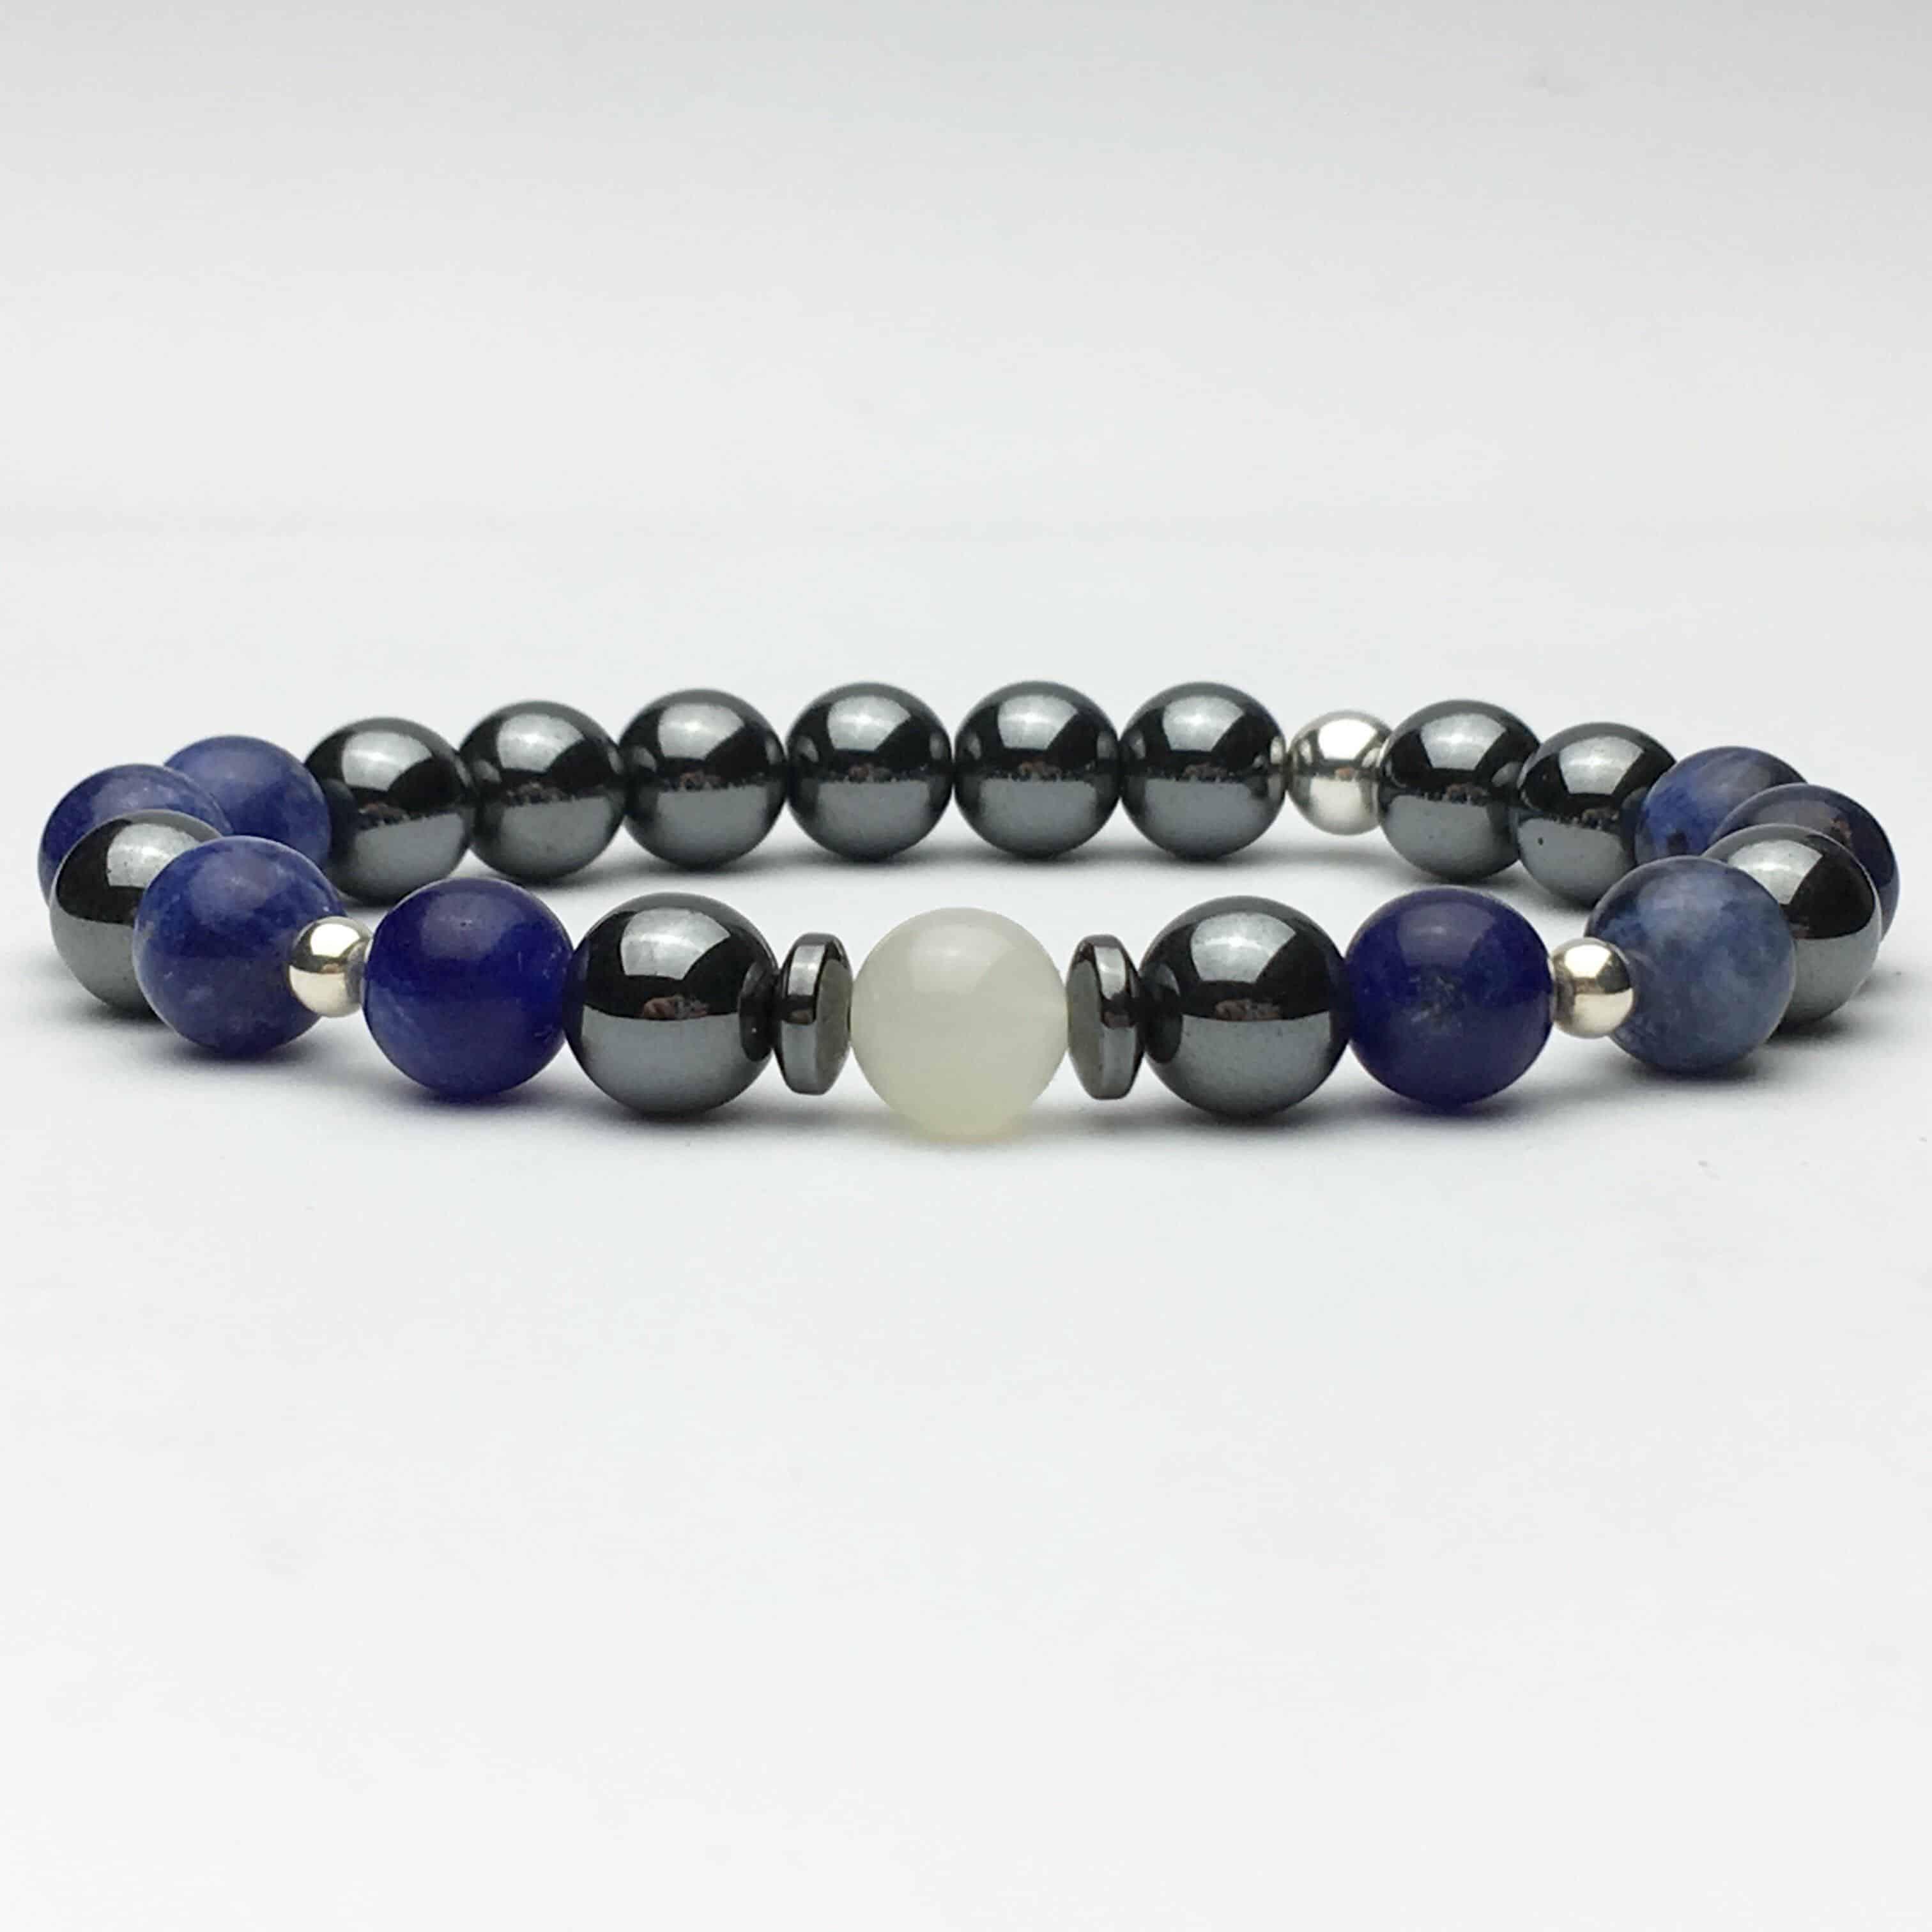 Moonstone, Hematite and Sodalite Bracelet